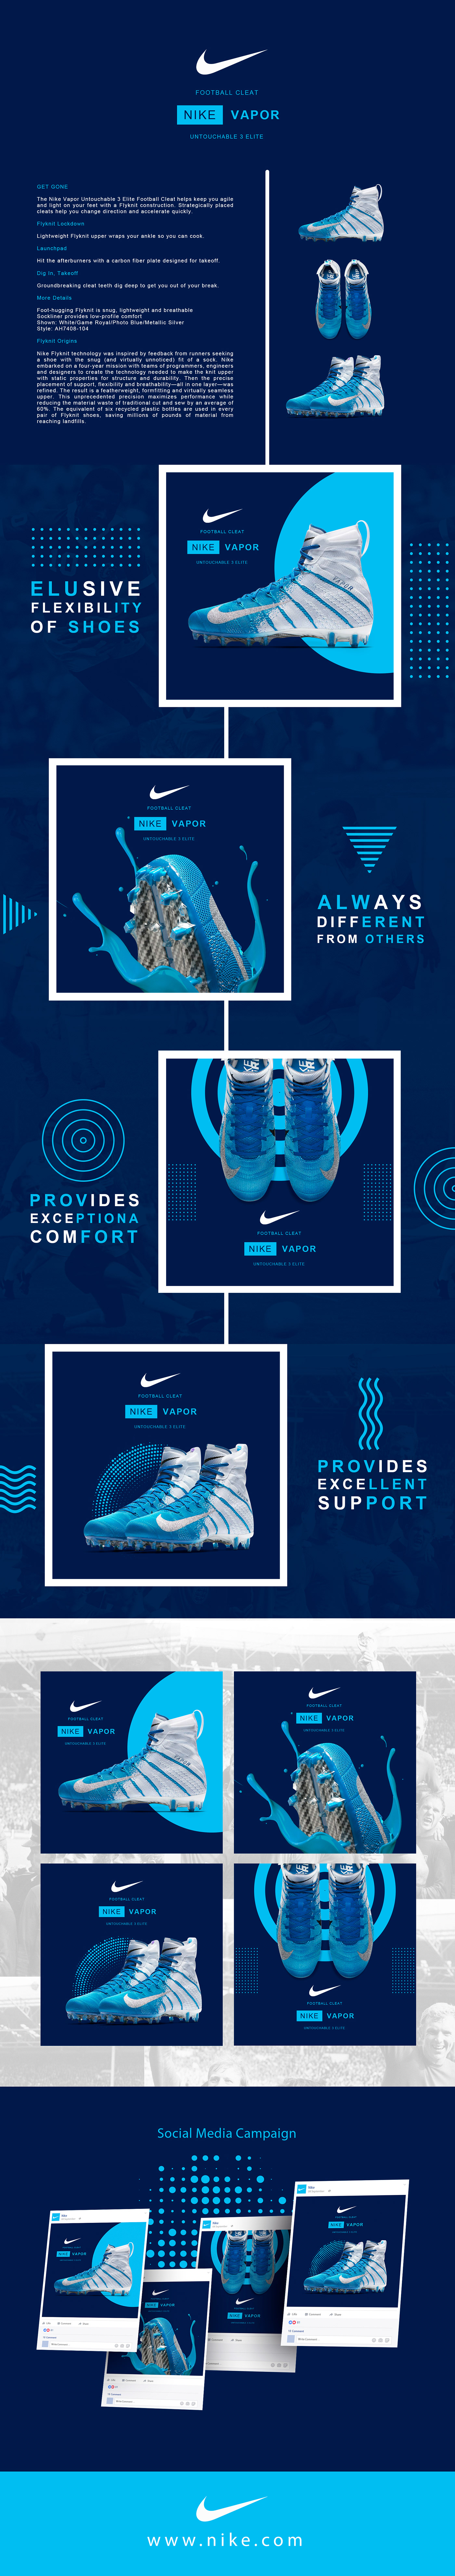 Nike social media ads campaign